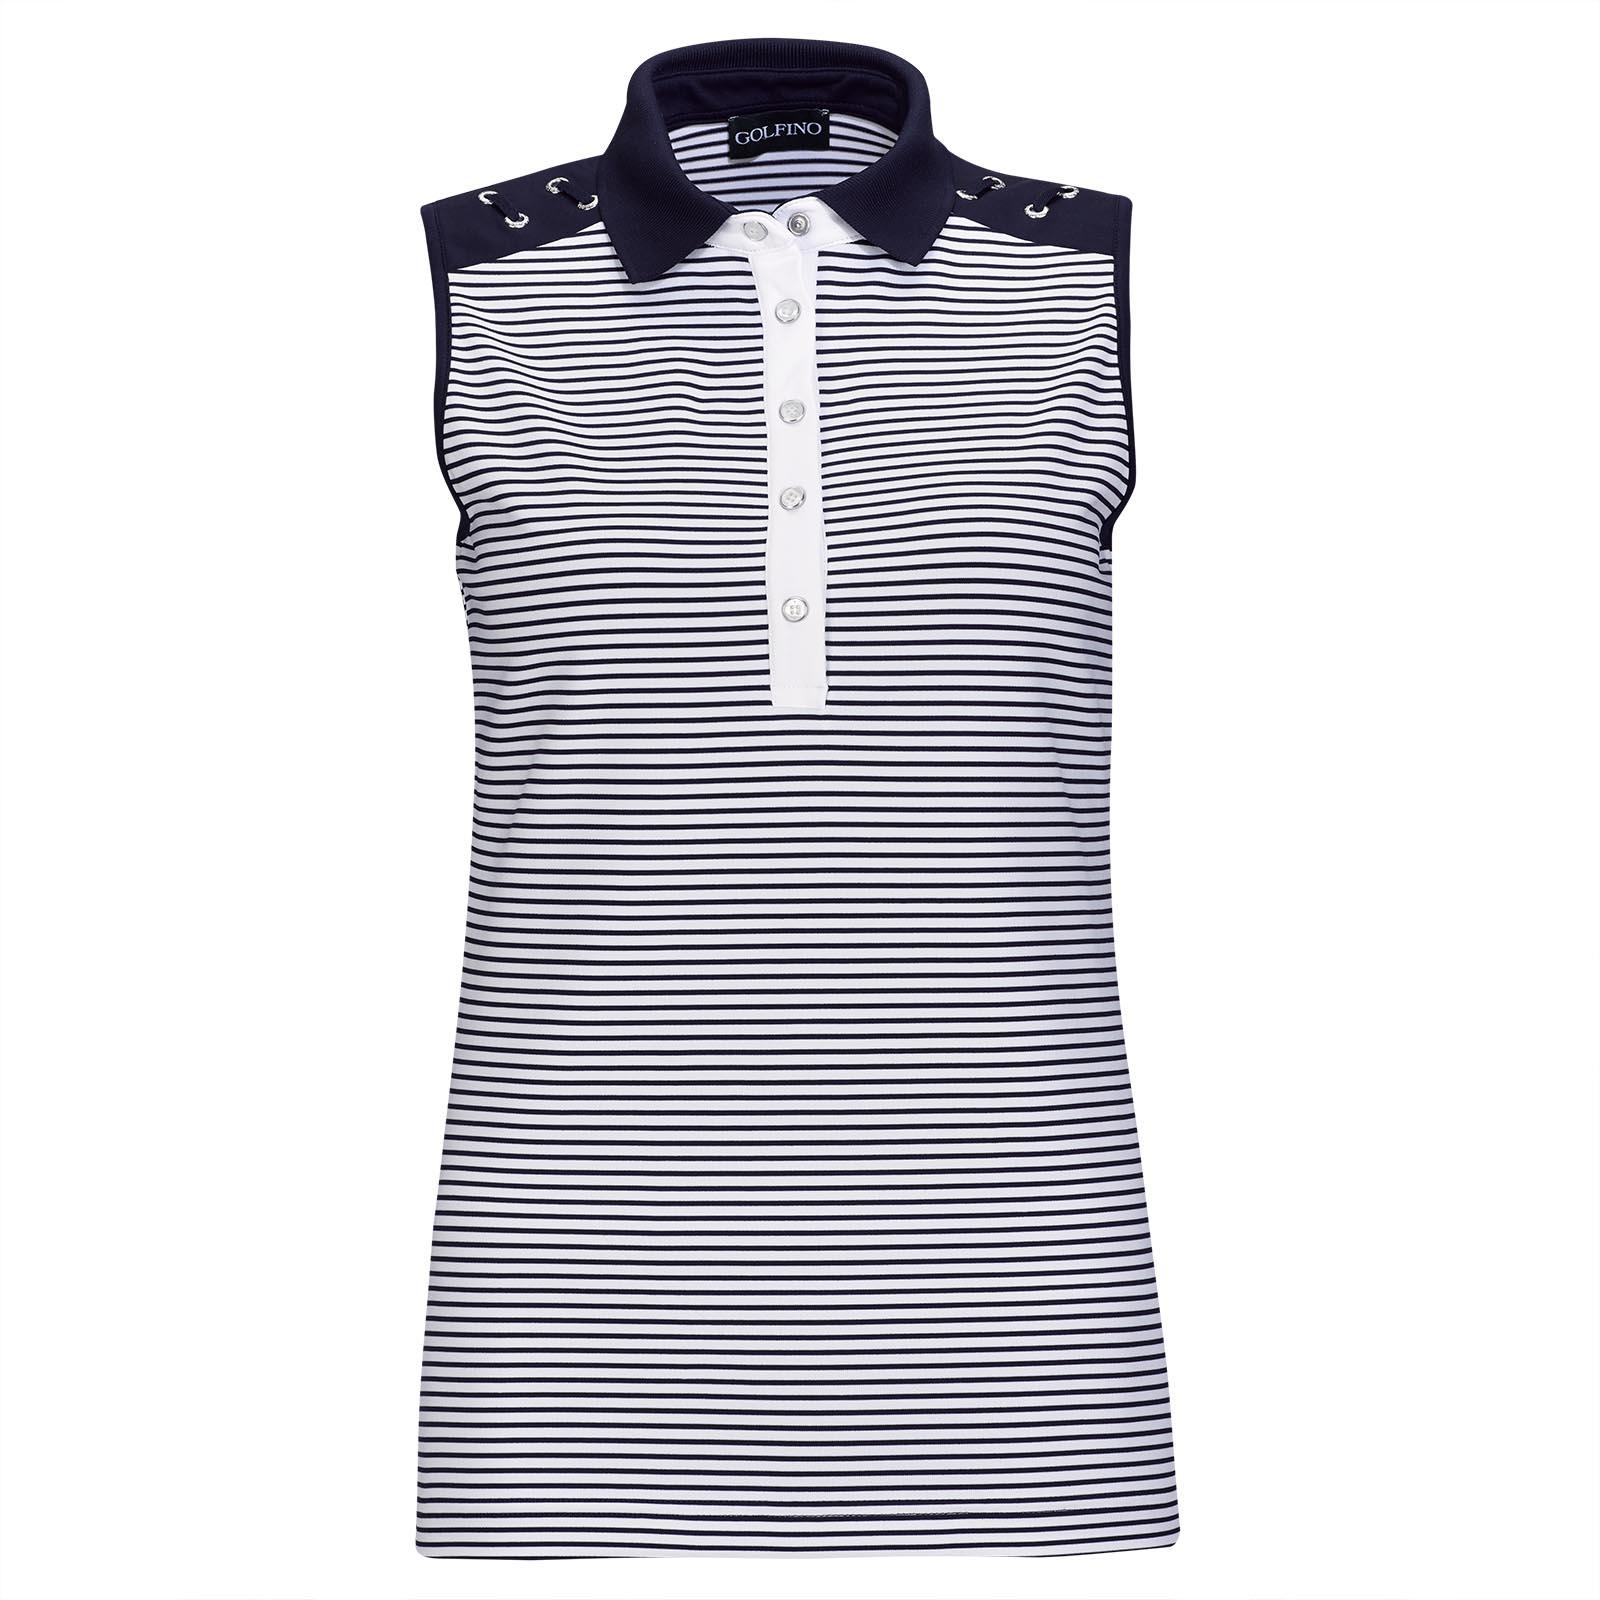 Ärmelloser Nautical Stripes Damen Golf-Troyer als trendstarker 1st-Layer